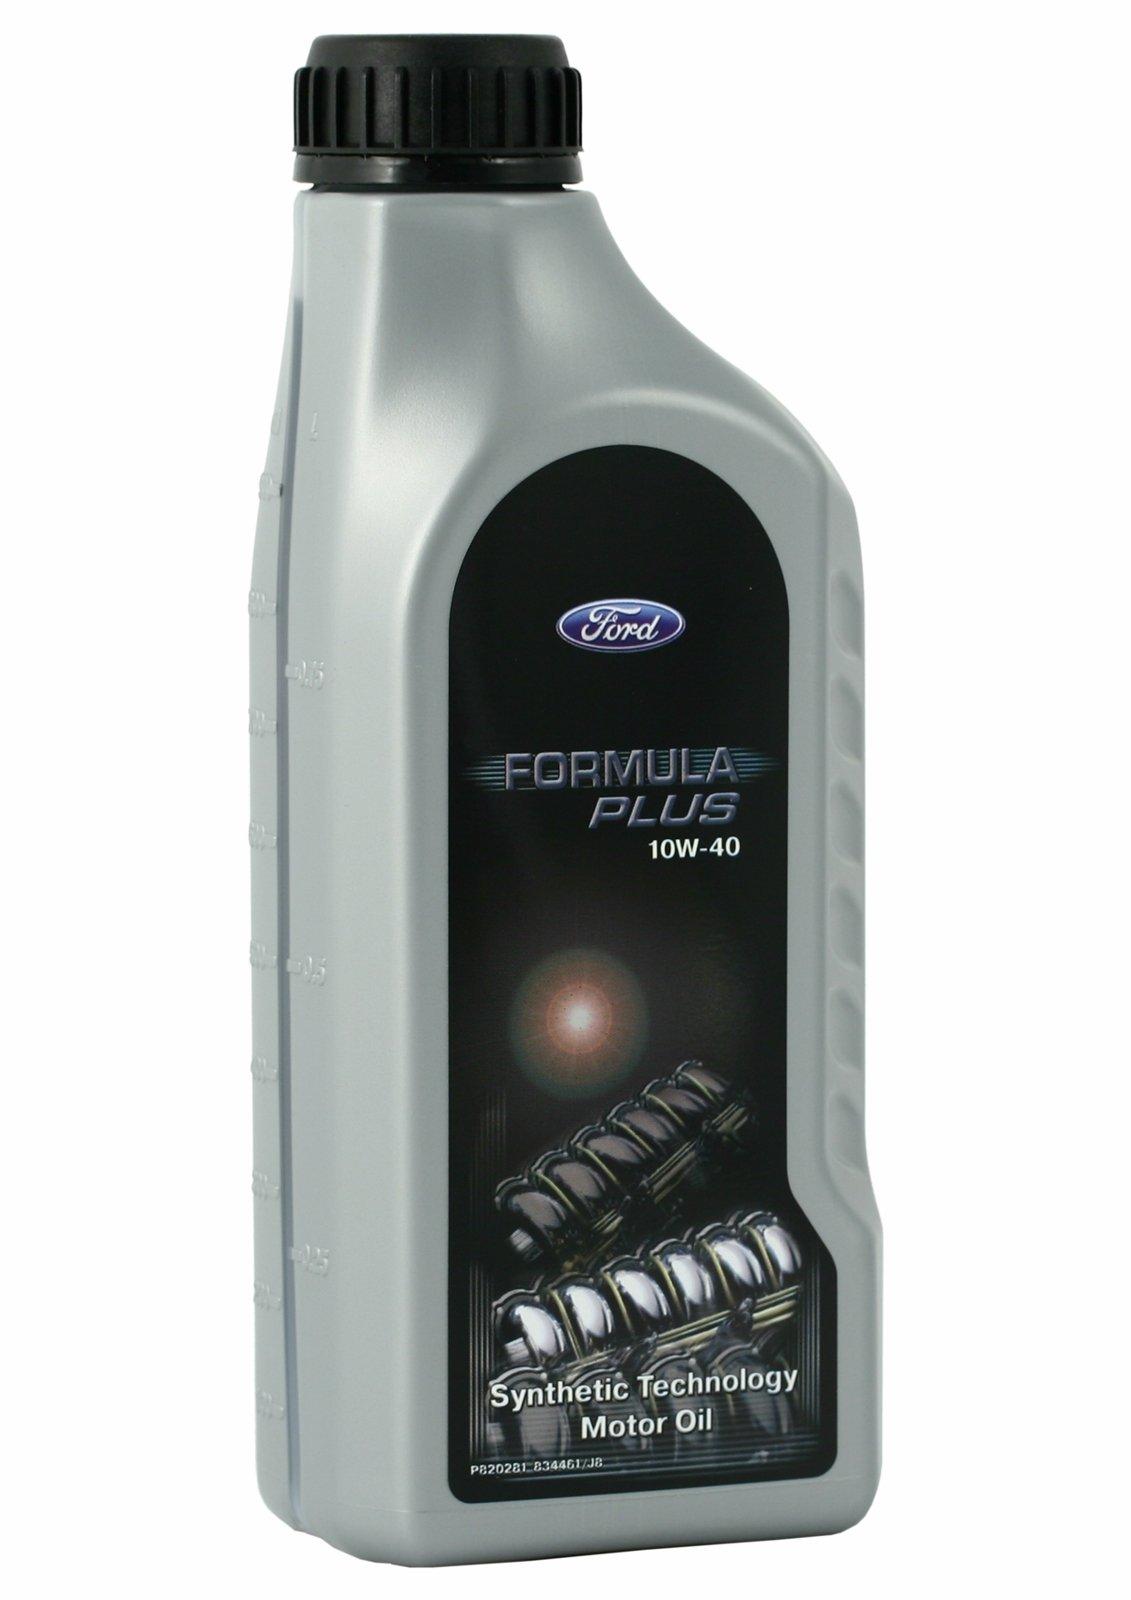 FORD FORMULA PLUS